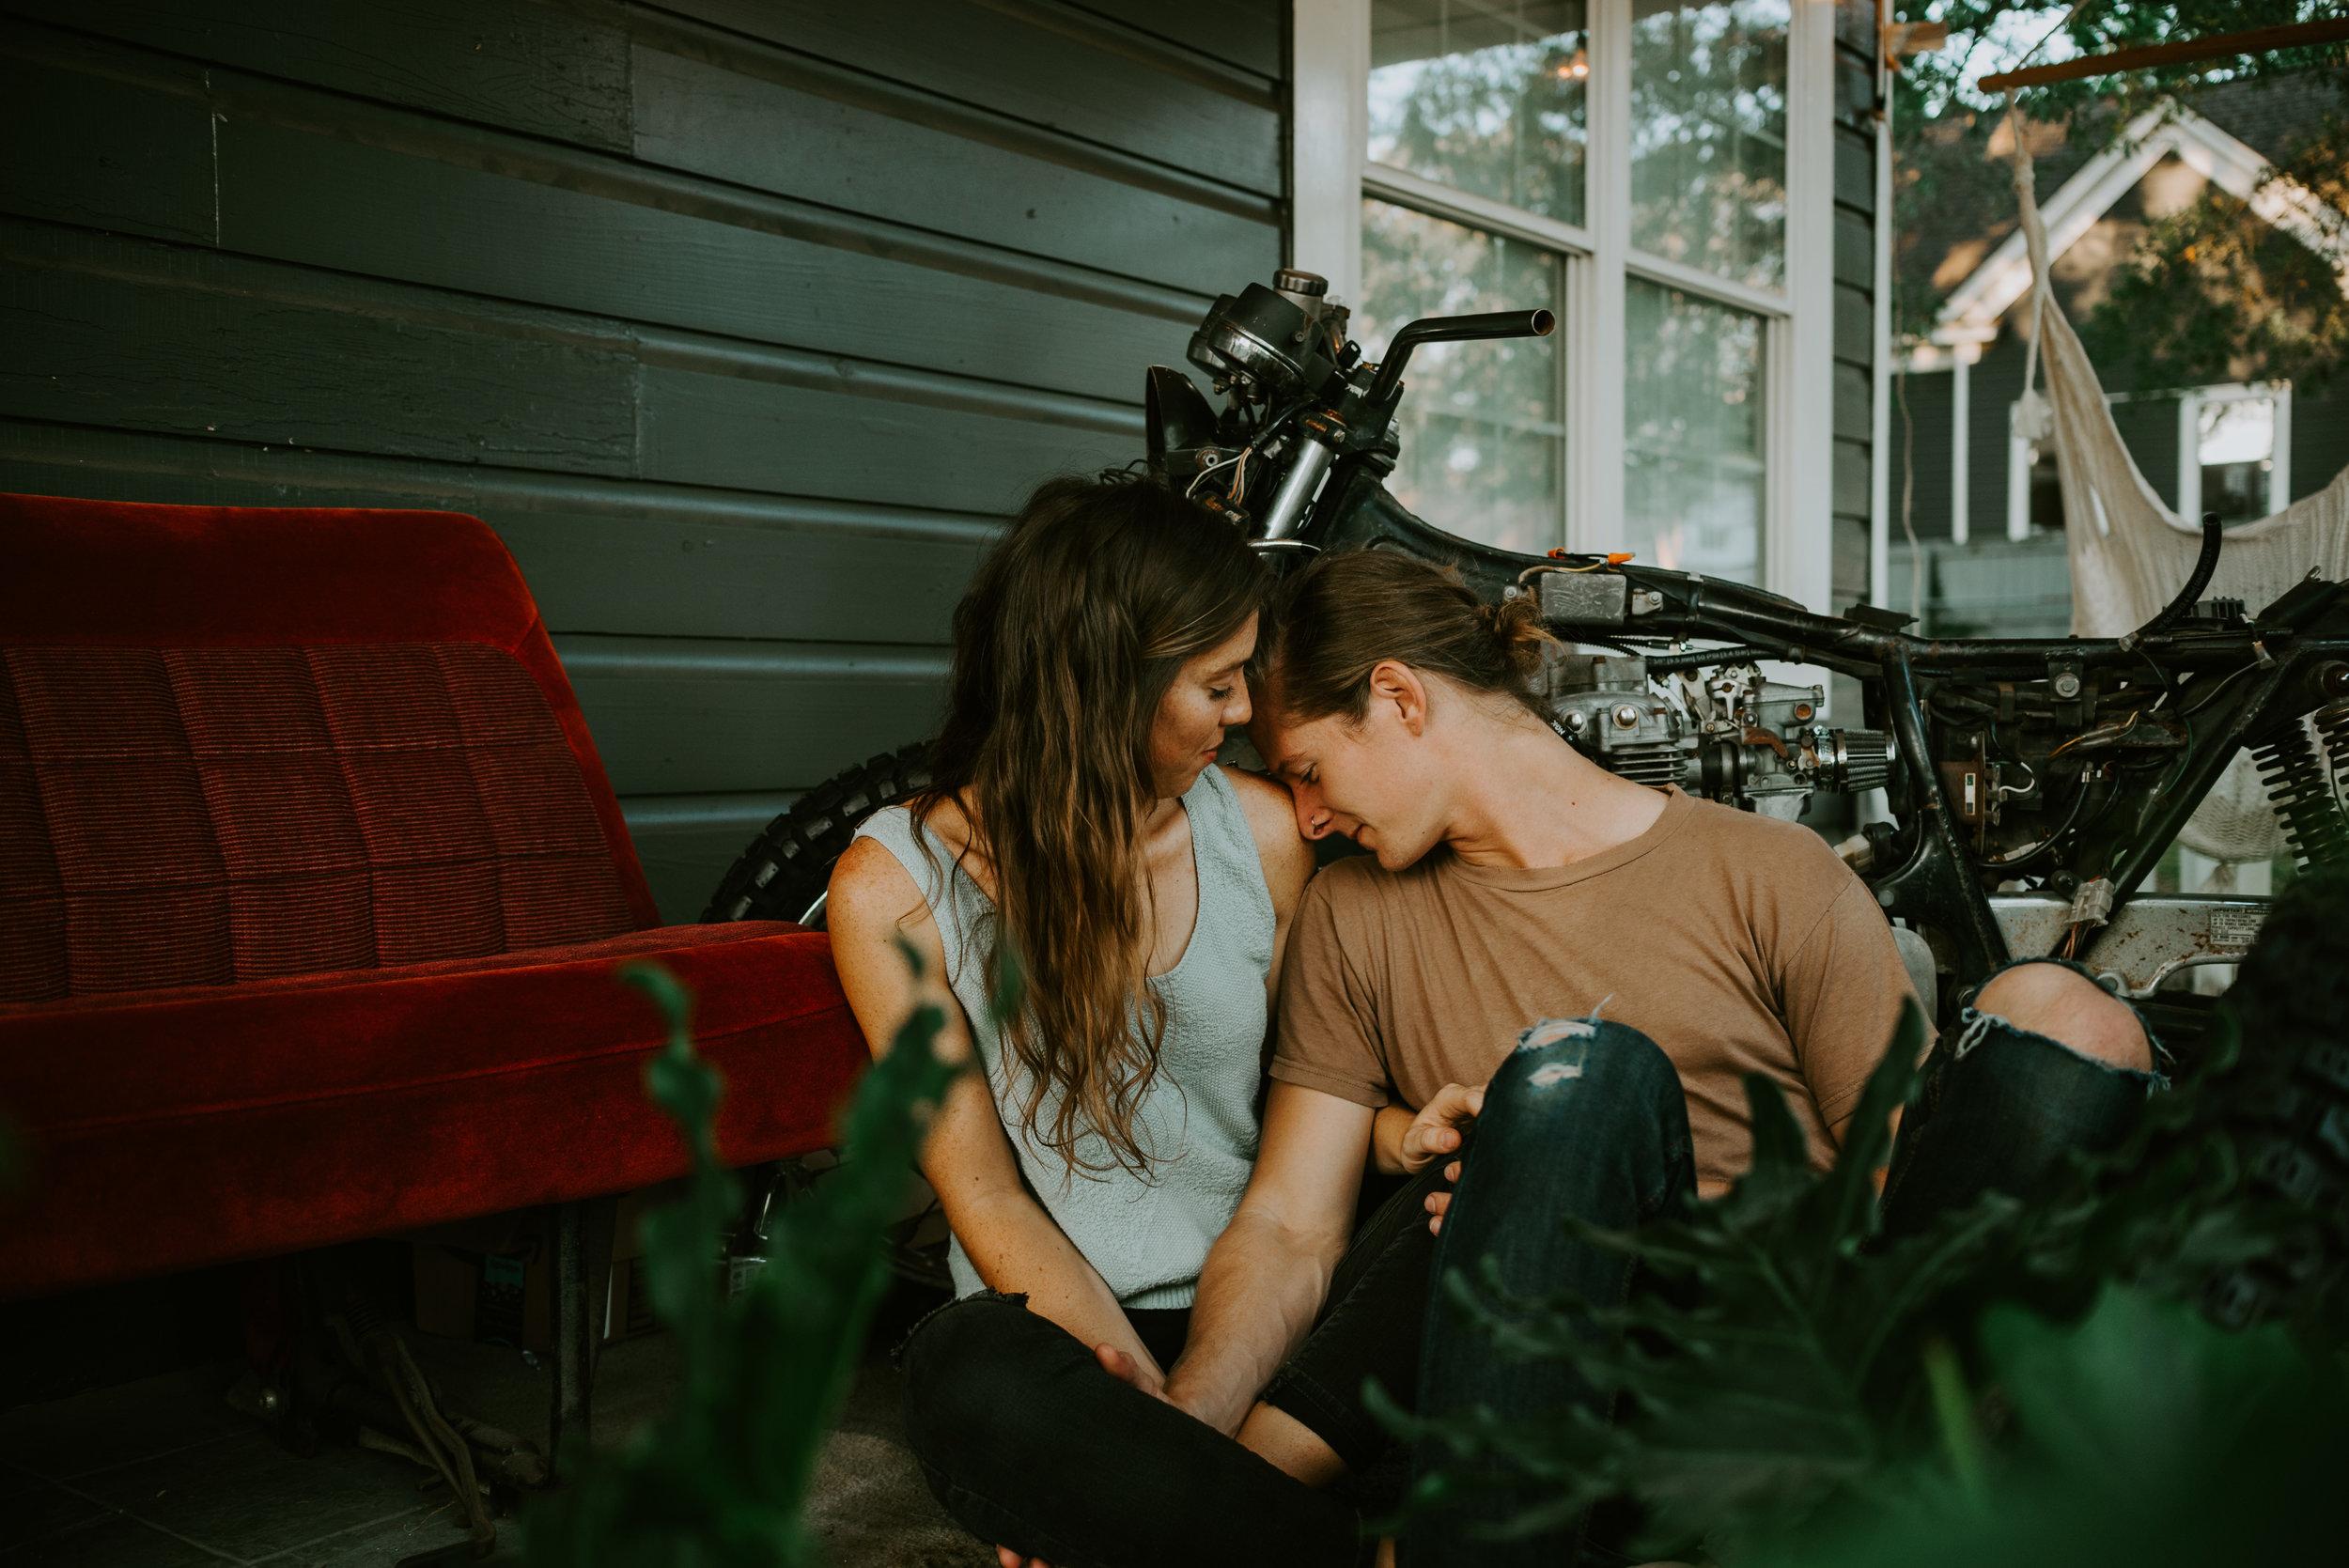 WonderlyCreative_Couples_7.9.18_Cameron&Alexis_-154.jpg